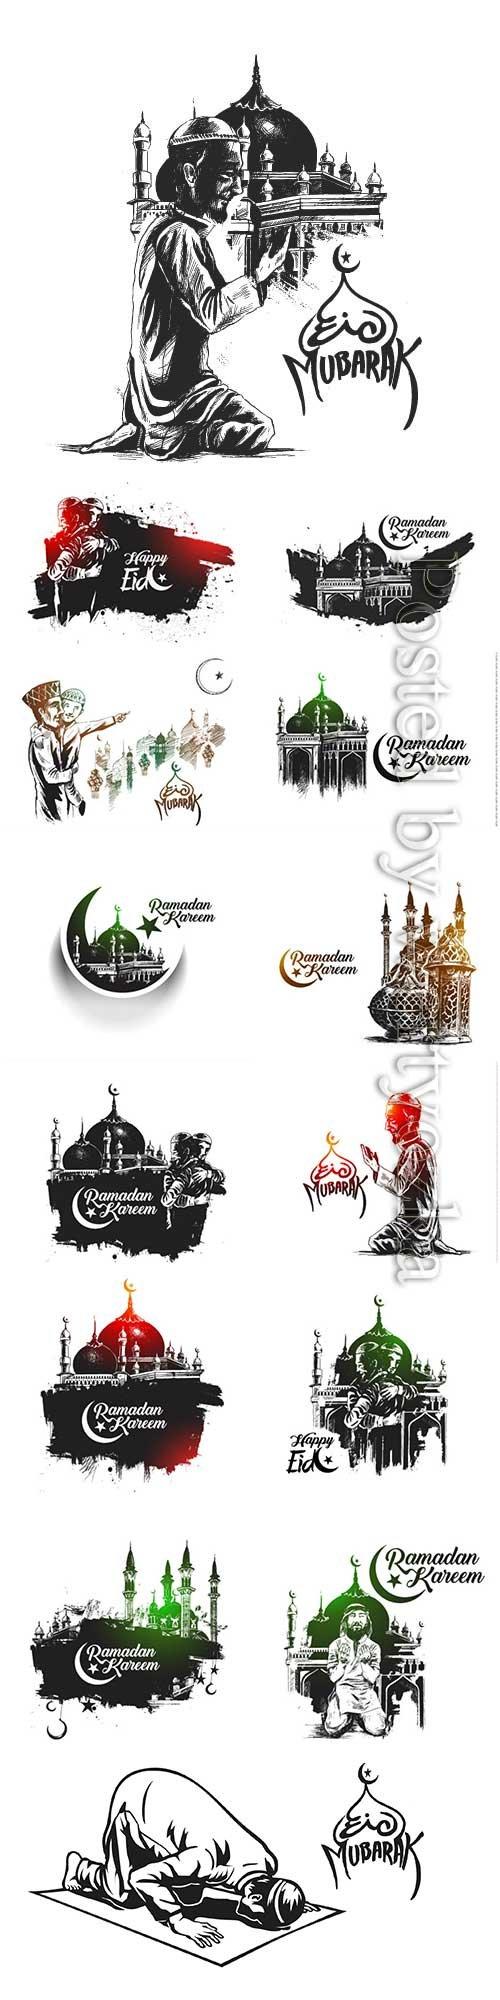 Ramadan Kareem Mosque or Masjid with calligraphy stylish lettering